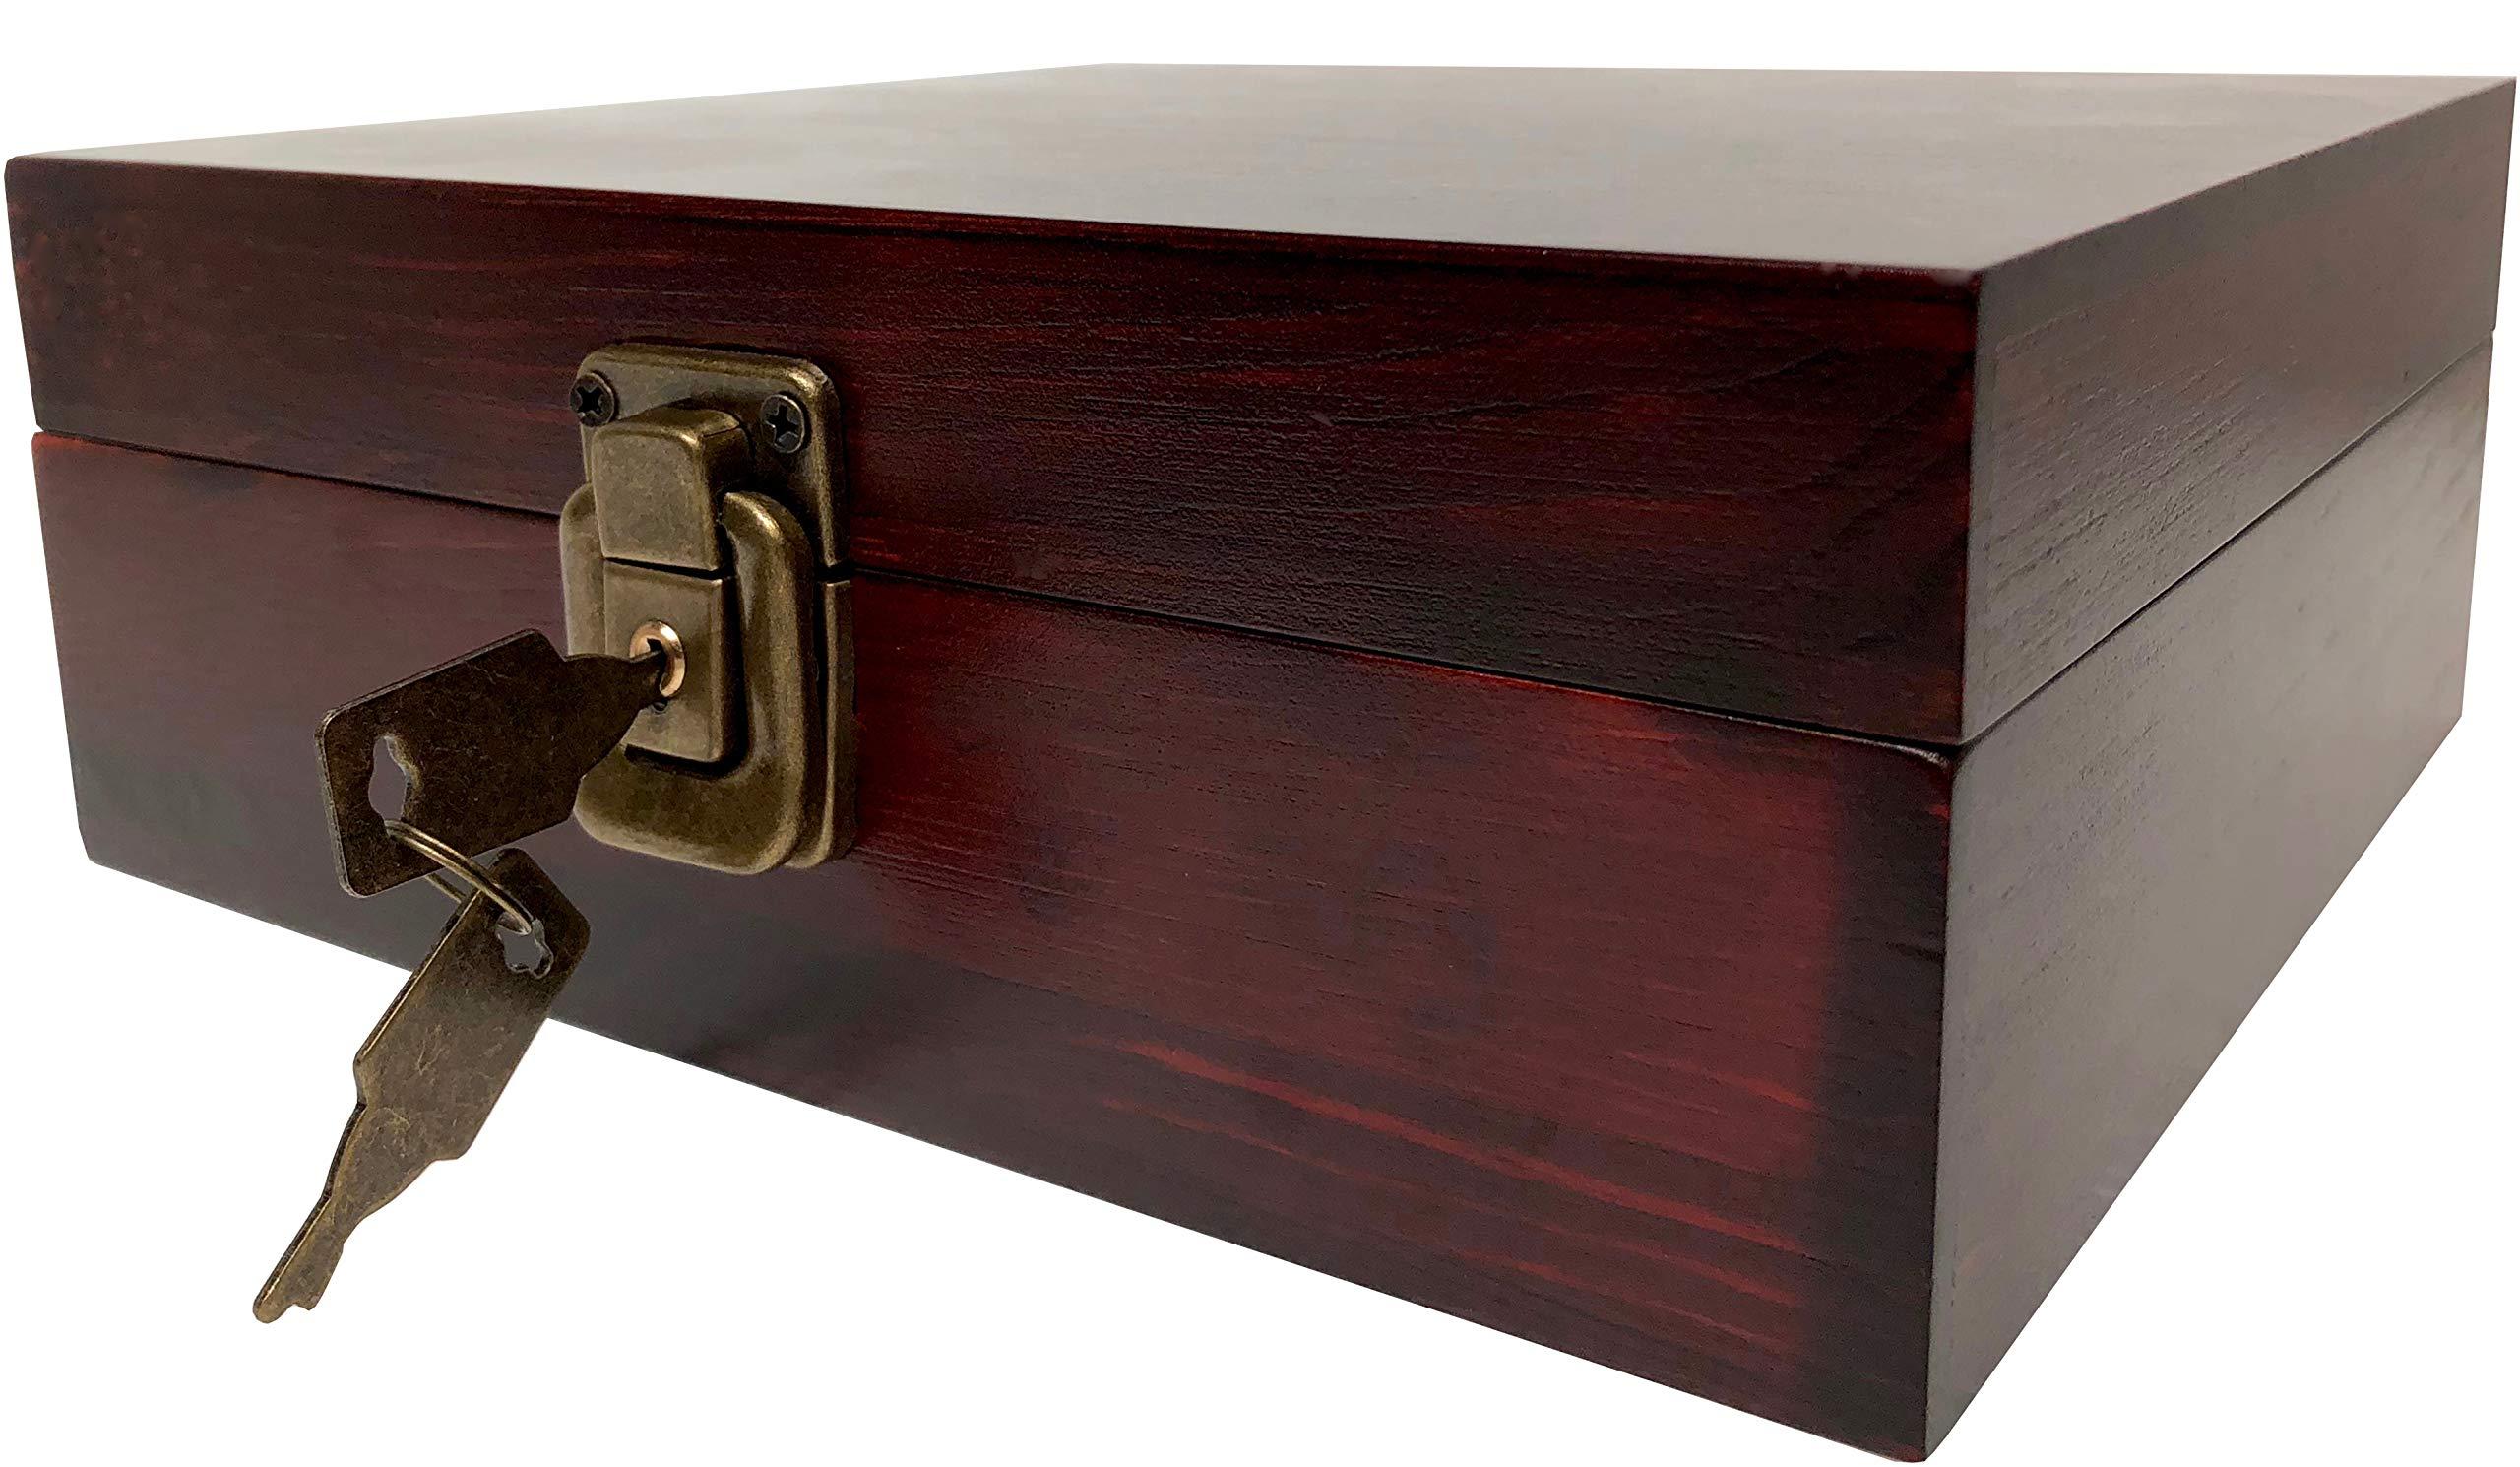 Locking Stash Box with Rolling Tray – Wood Stash Box with Lock – Wood Storage Box Stash Boxes (Dark Brown)